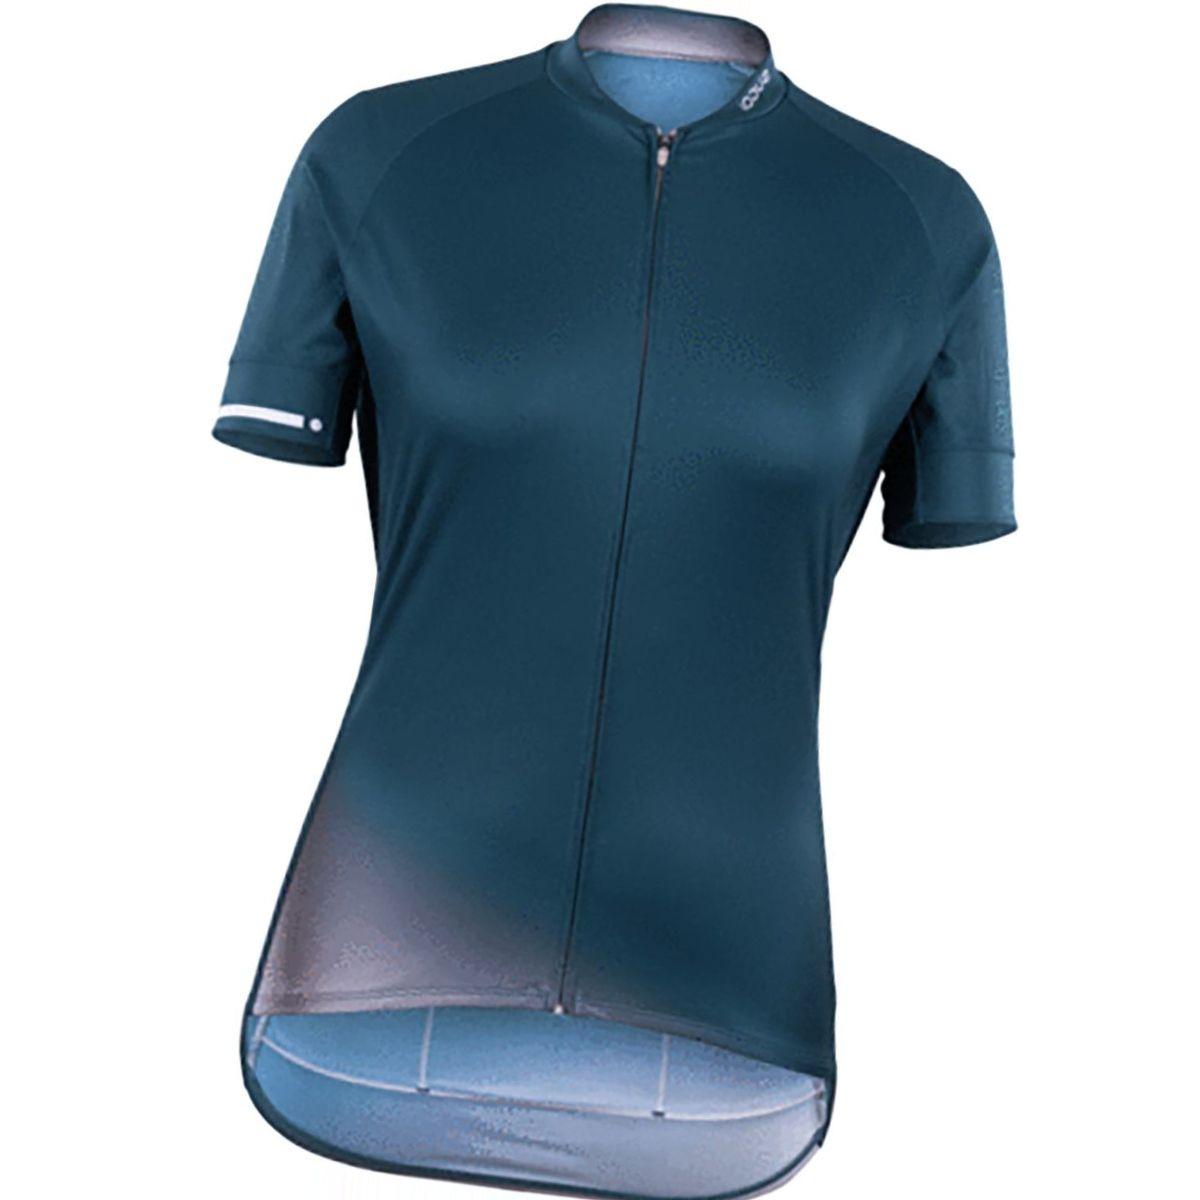 SUGOi Evolution Zap Short-Sleeve Jersey - Women's